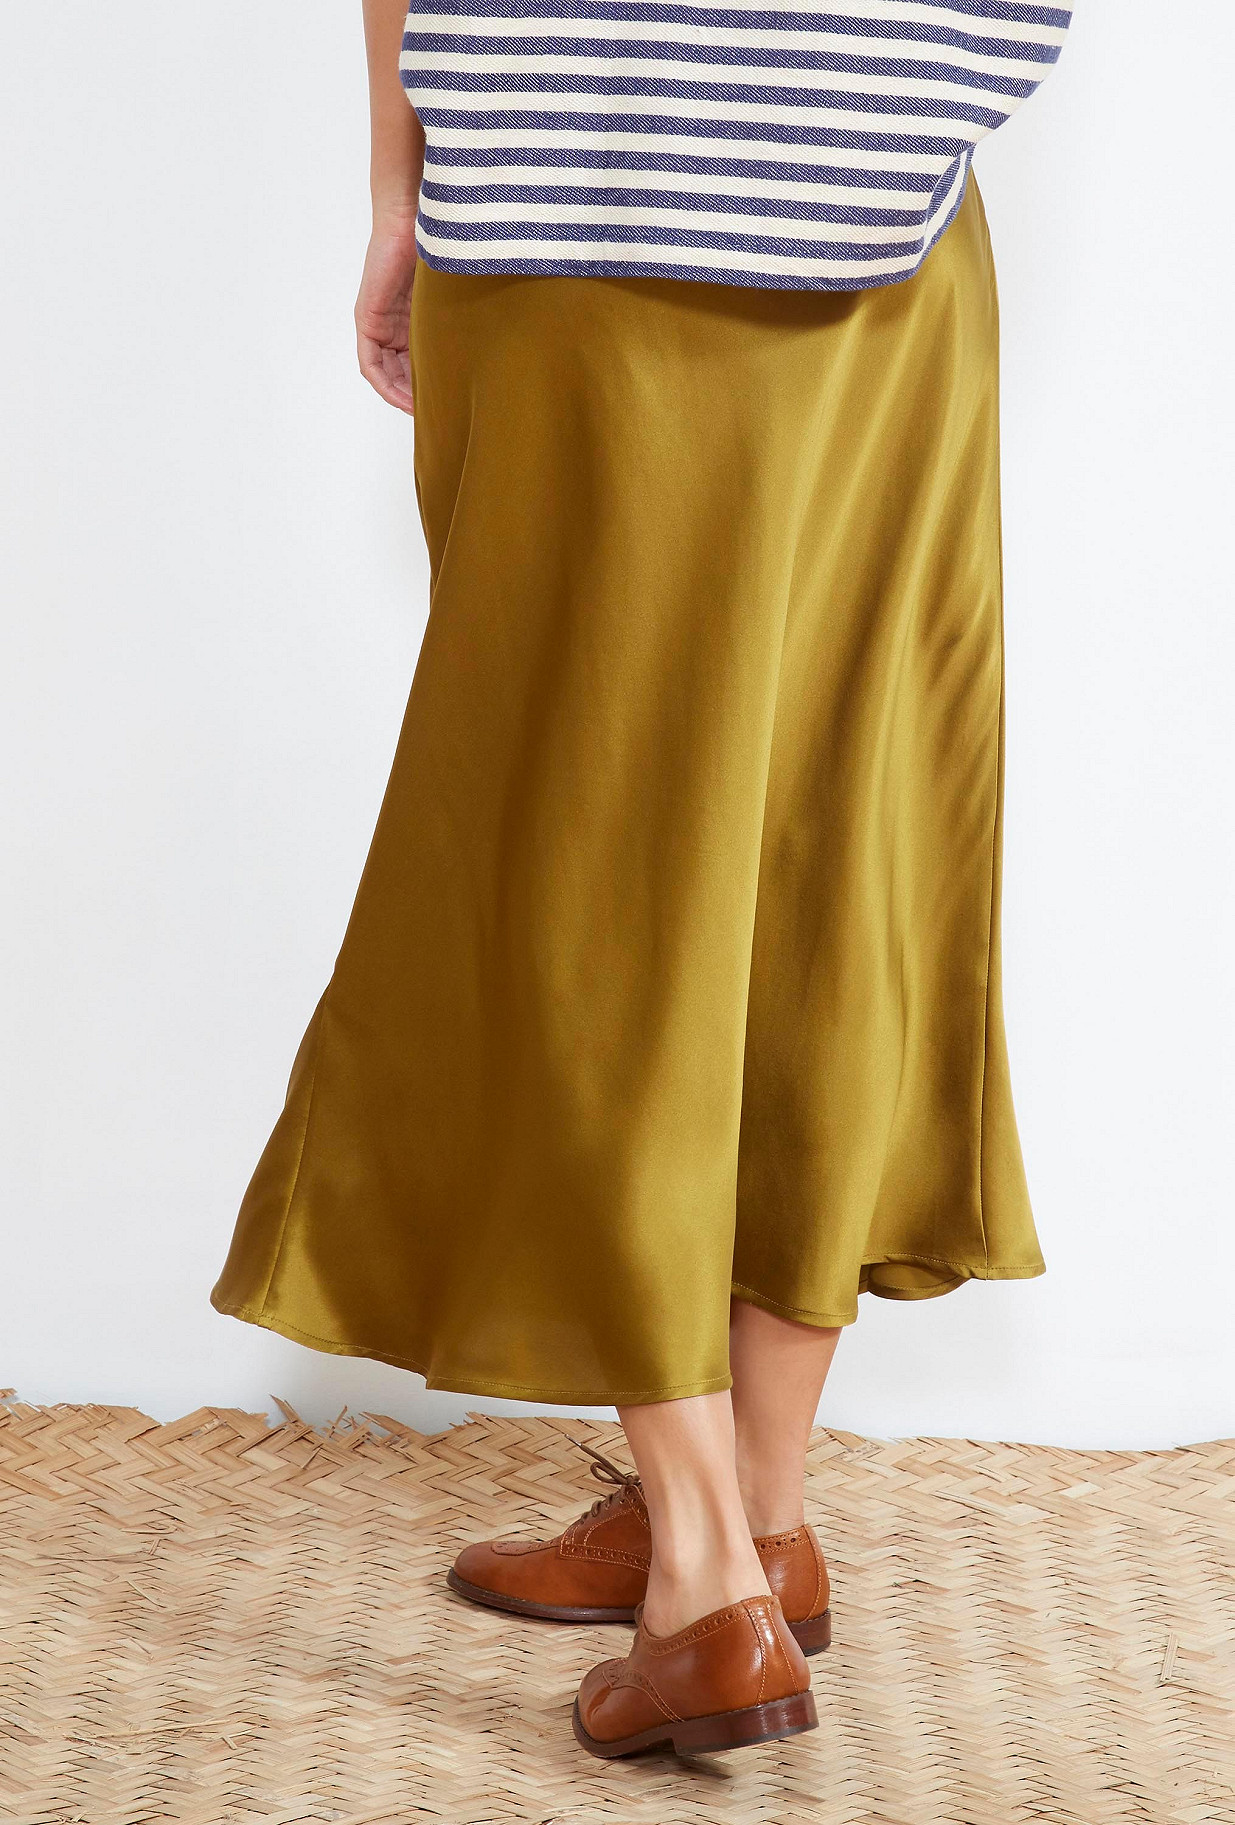 Khaki  SKIRT  Sesame Mes demoiselles fashion clothes designer Paris